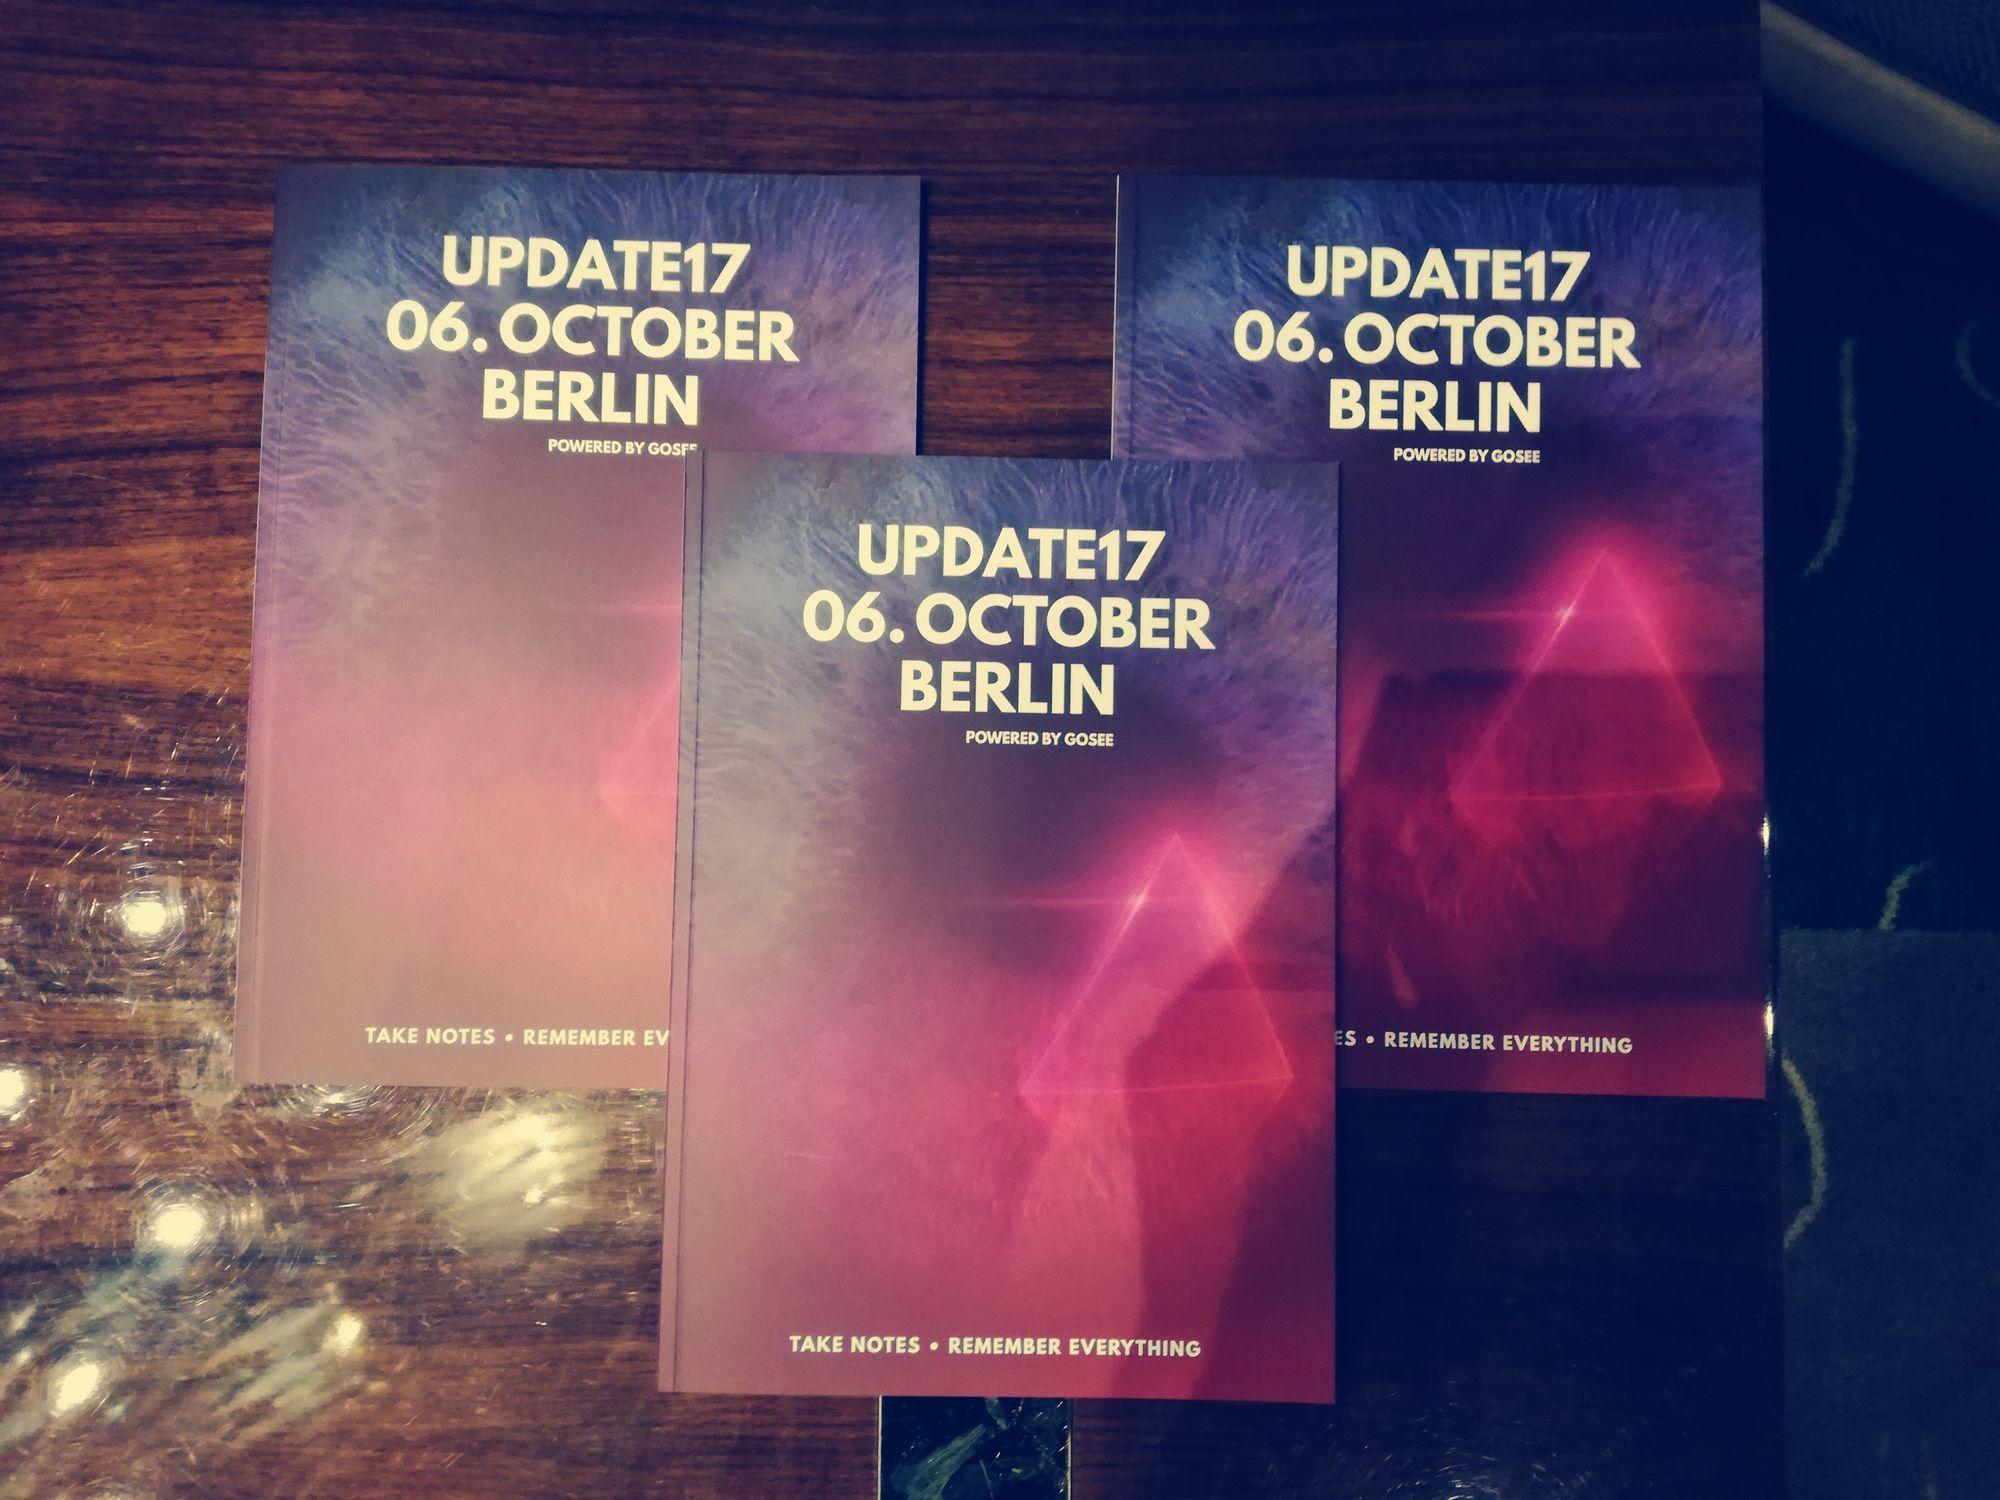 UPDATE17 BERLIN